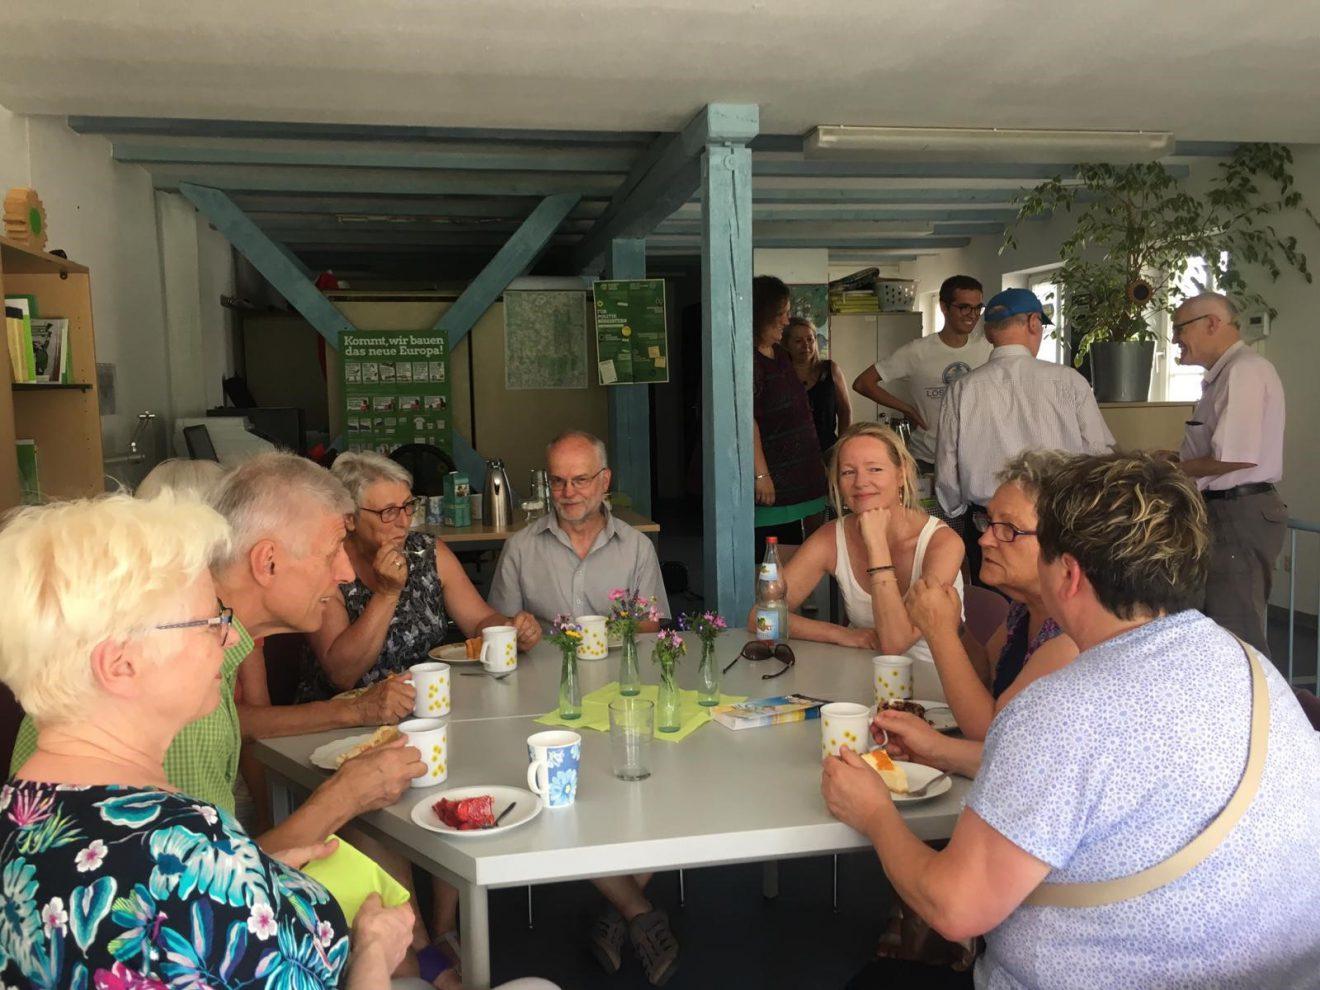 Wann Privatmensch, wann Politikerin? Offenes Café und Böblinger Stadtfest mit Thekla Walker MdL